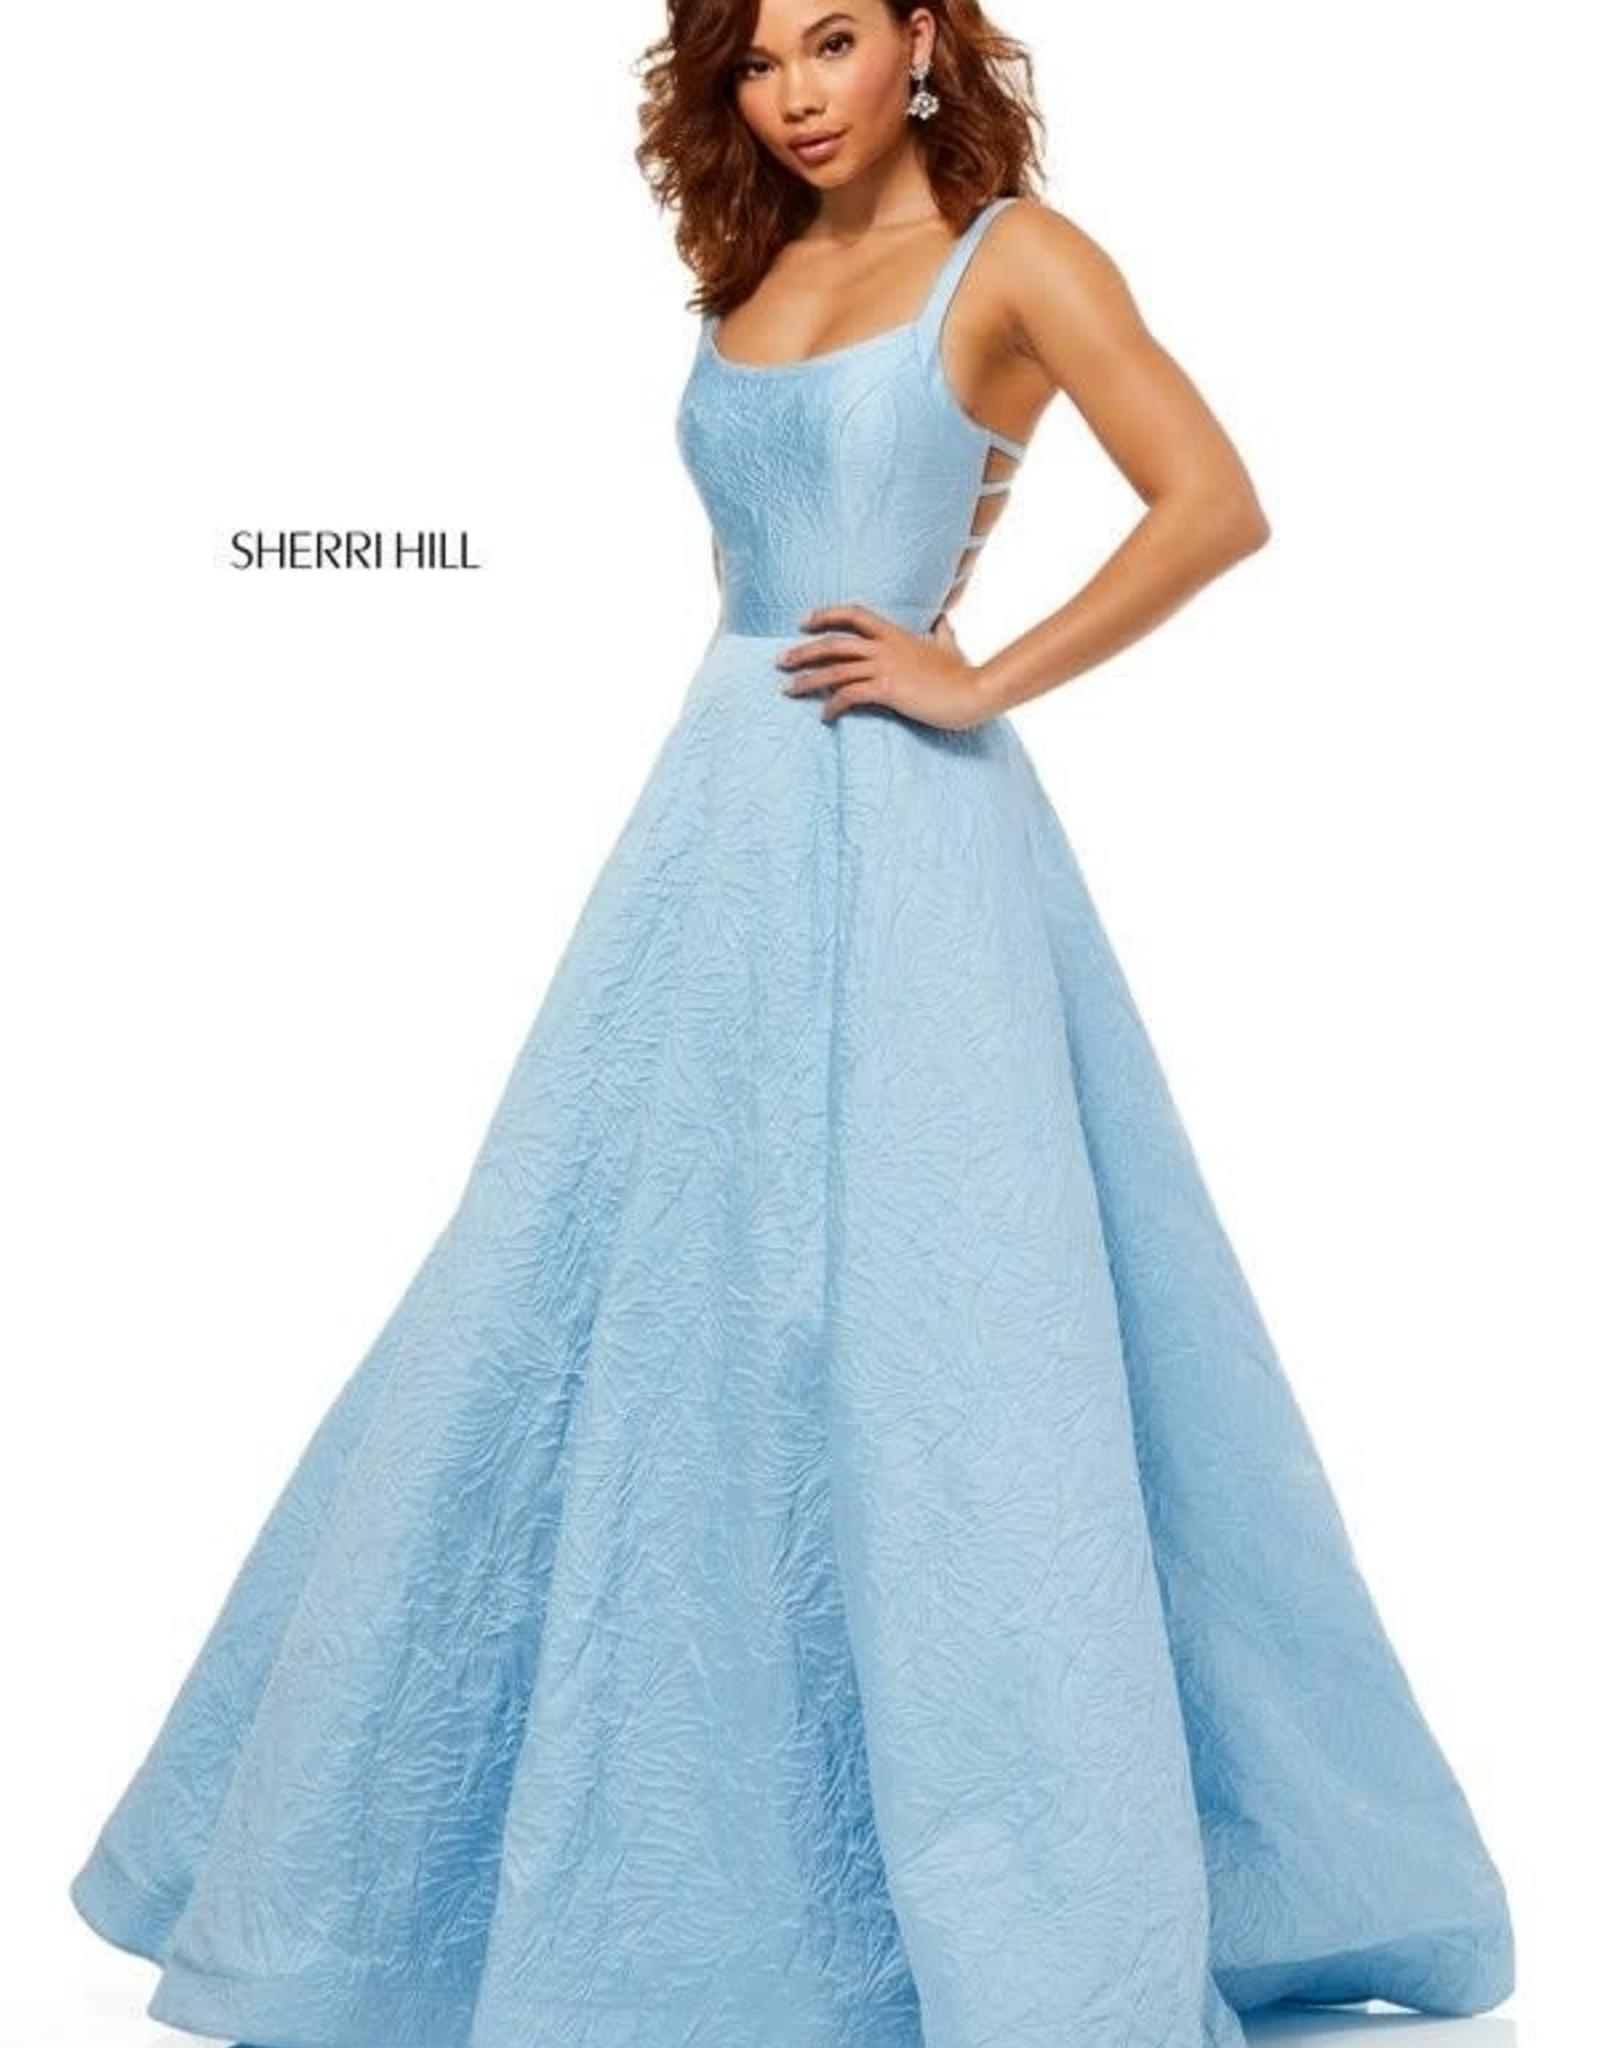 Sherri Hill Sherri Hill Light Blue 18